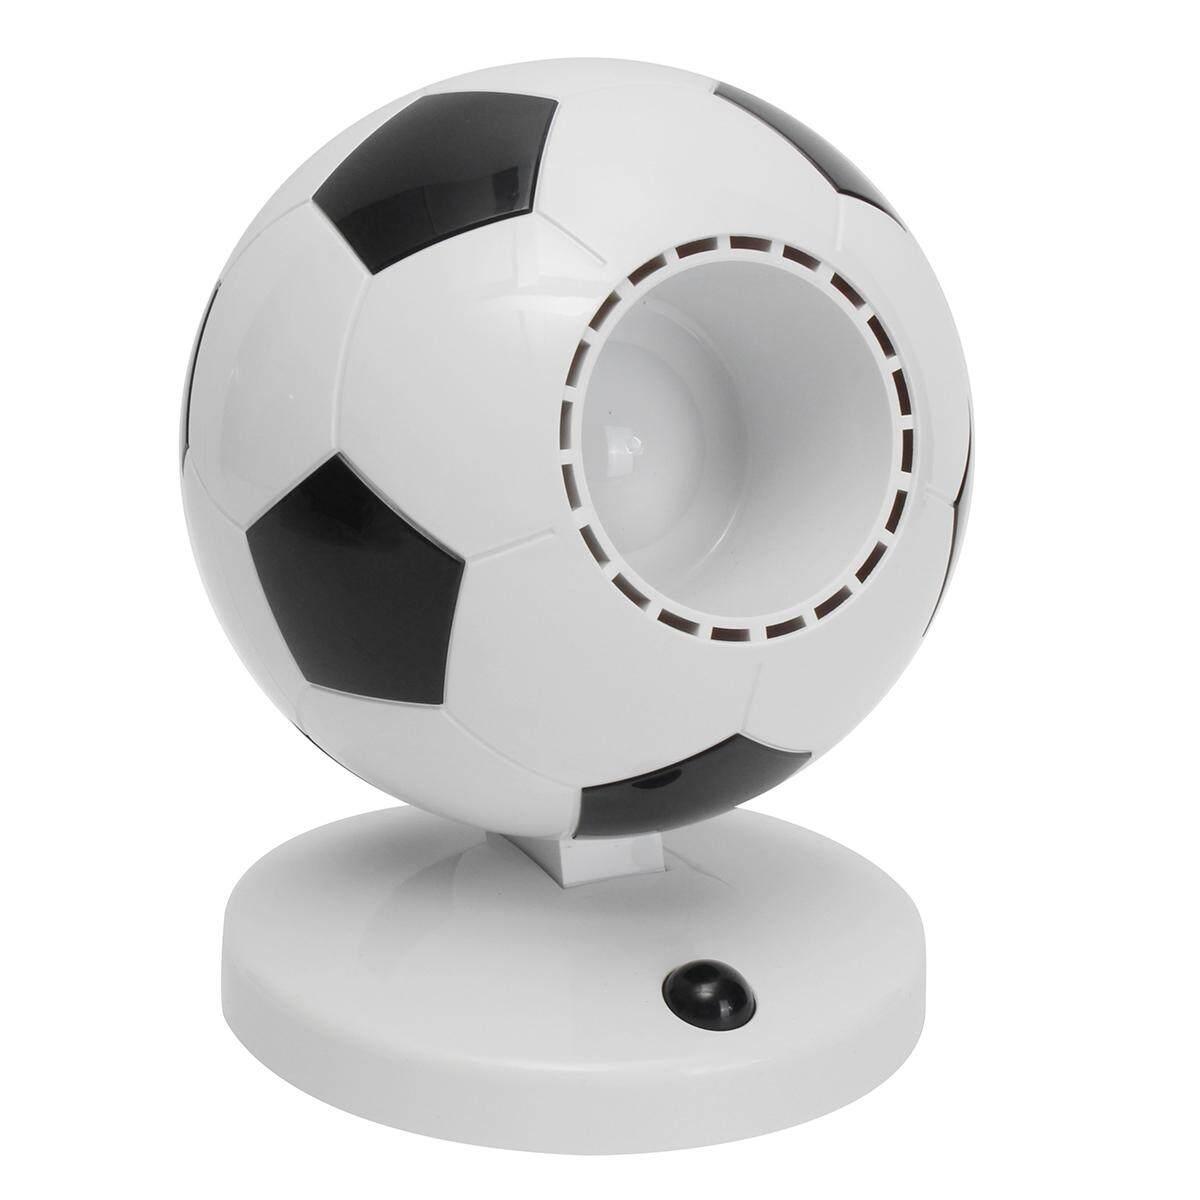 (photo)Football Bladeless Fan AirFlow Cooling fan Circular Handheld Portable